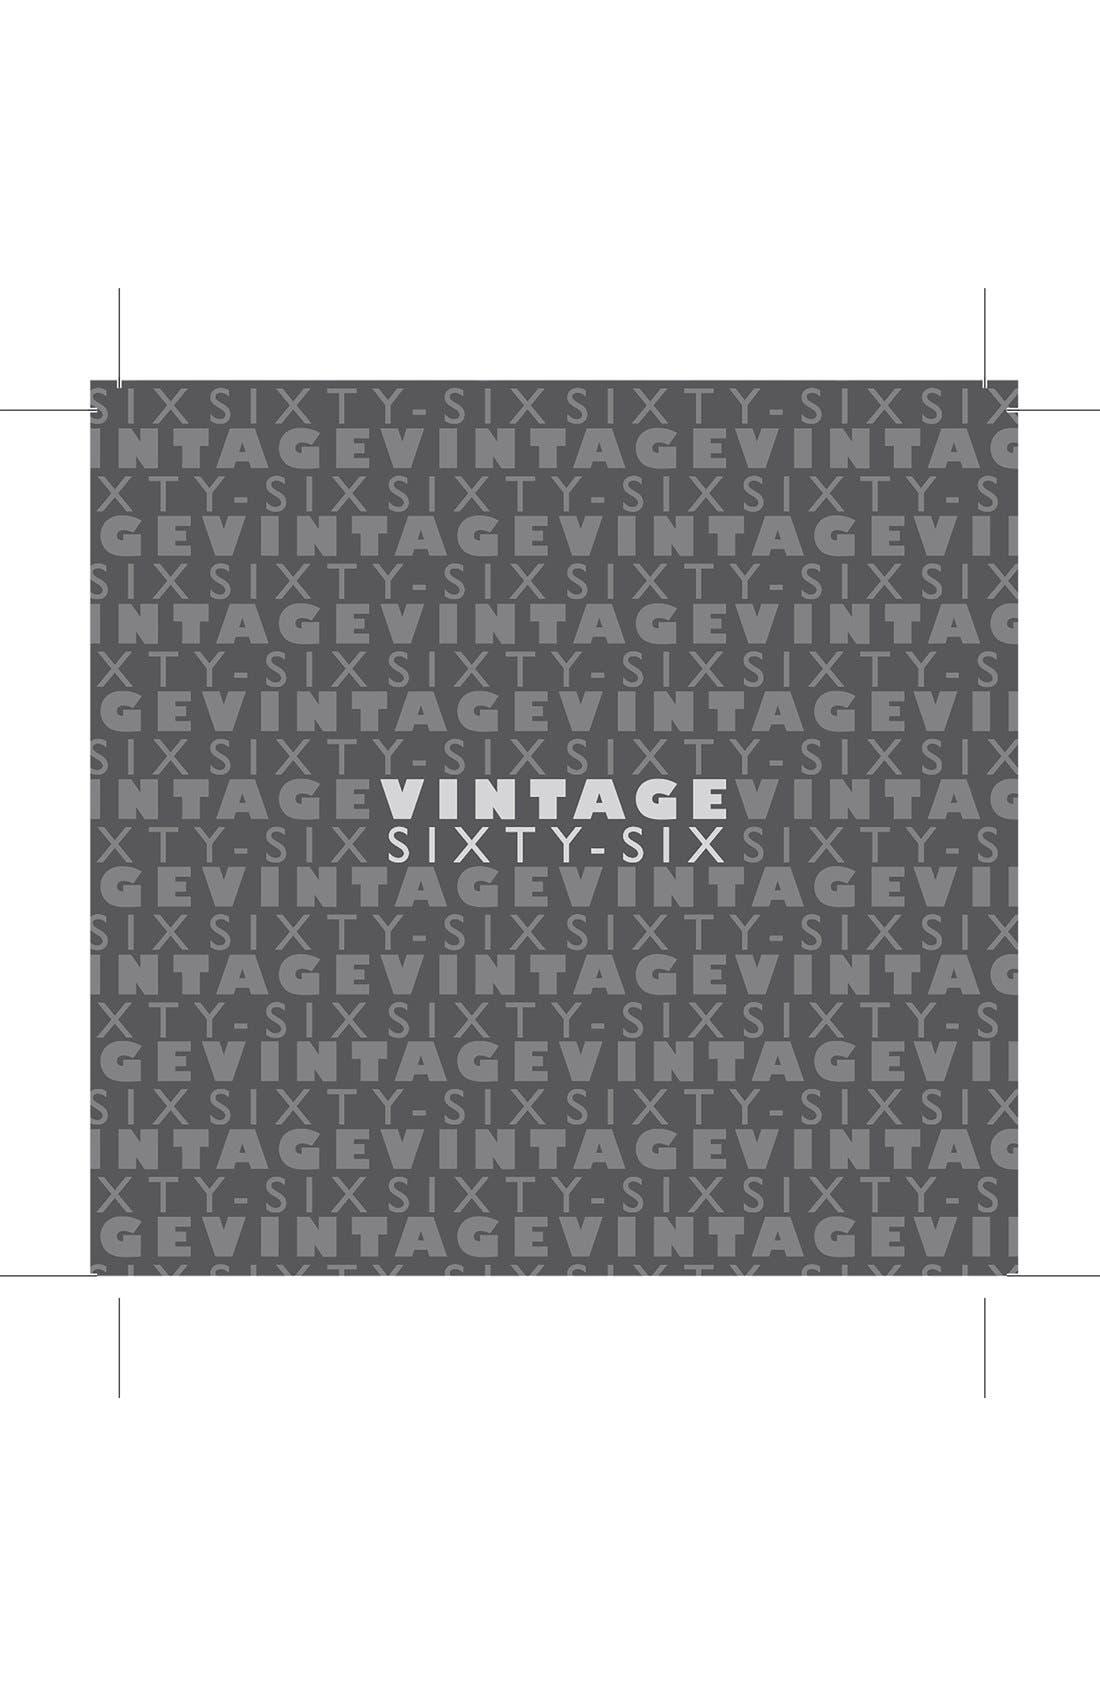 Alternate Image 2  - Alex and Ani 'Vintage 66 - Kingston' Wrap Bracelet